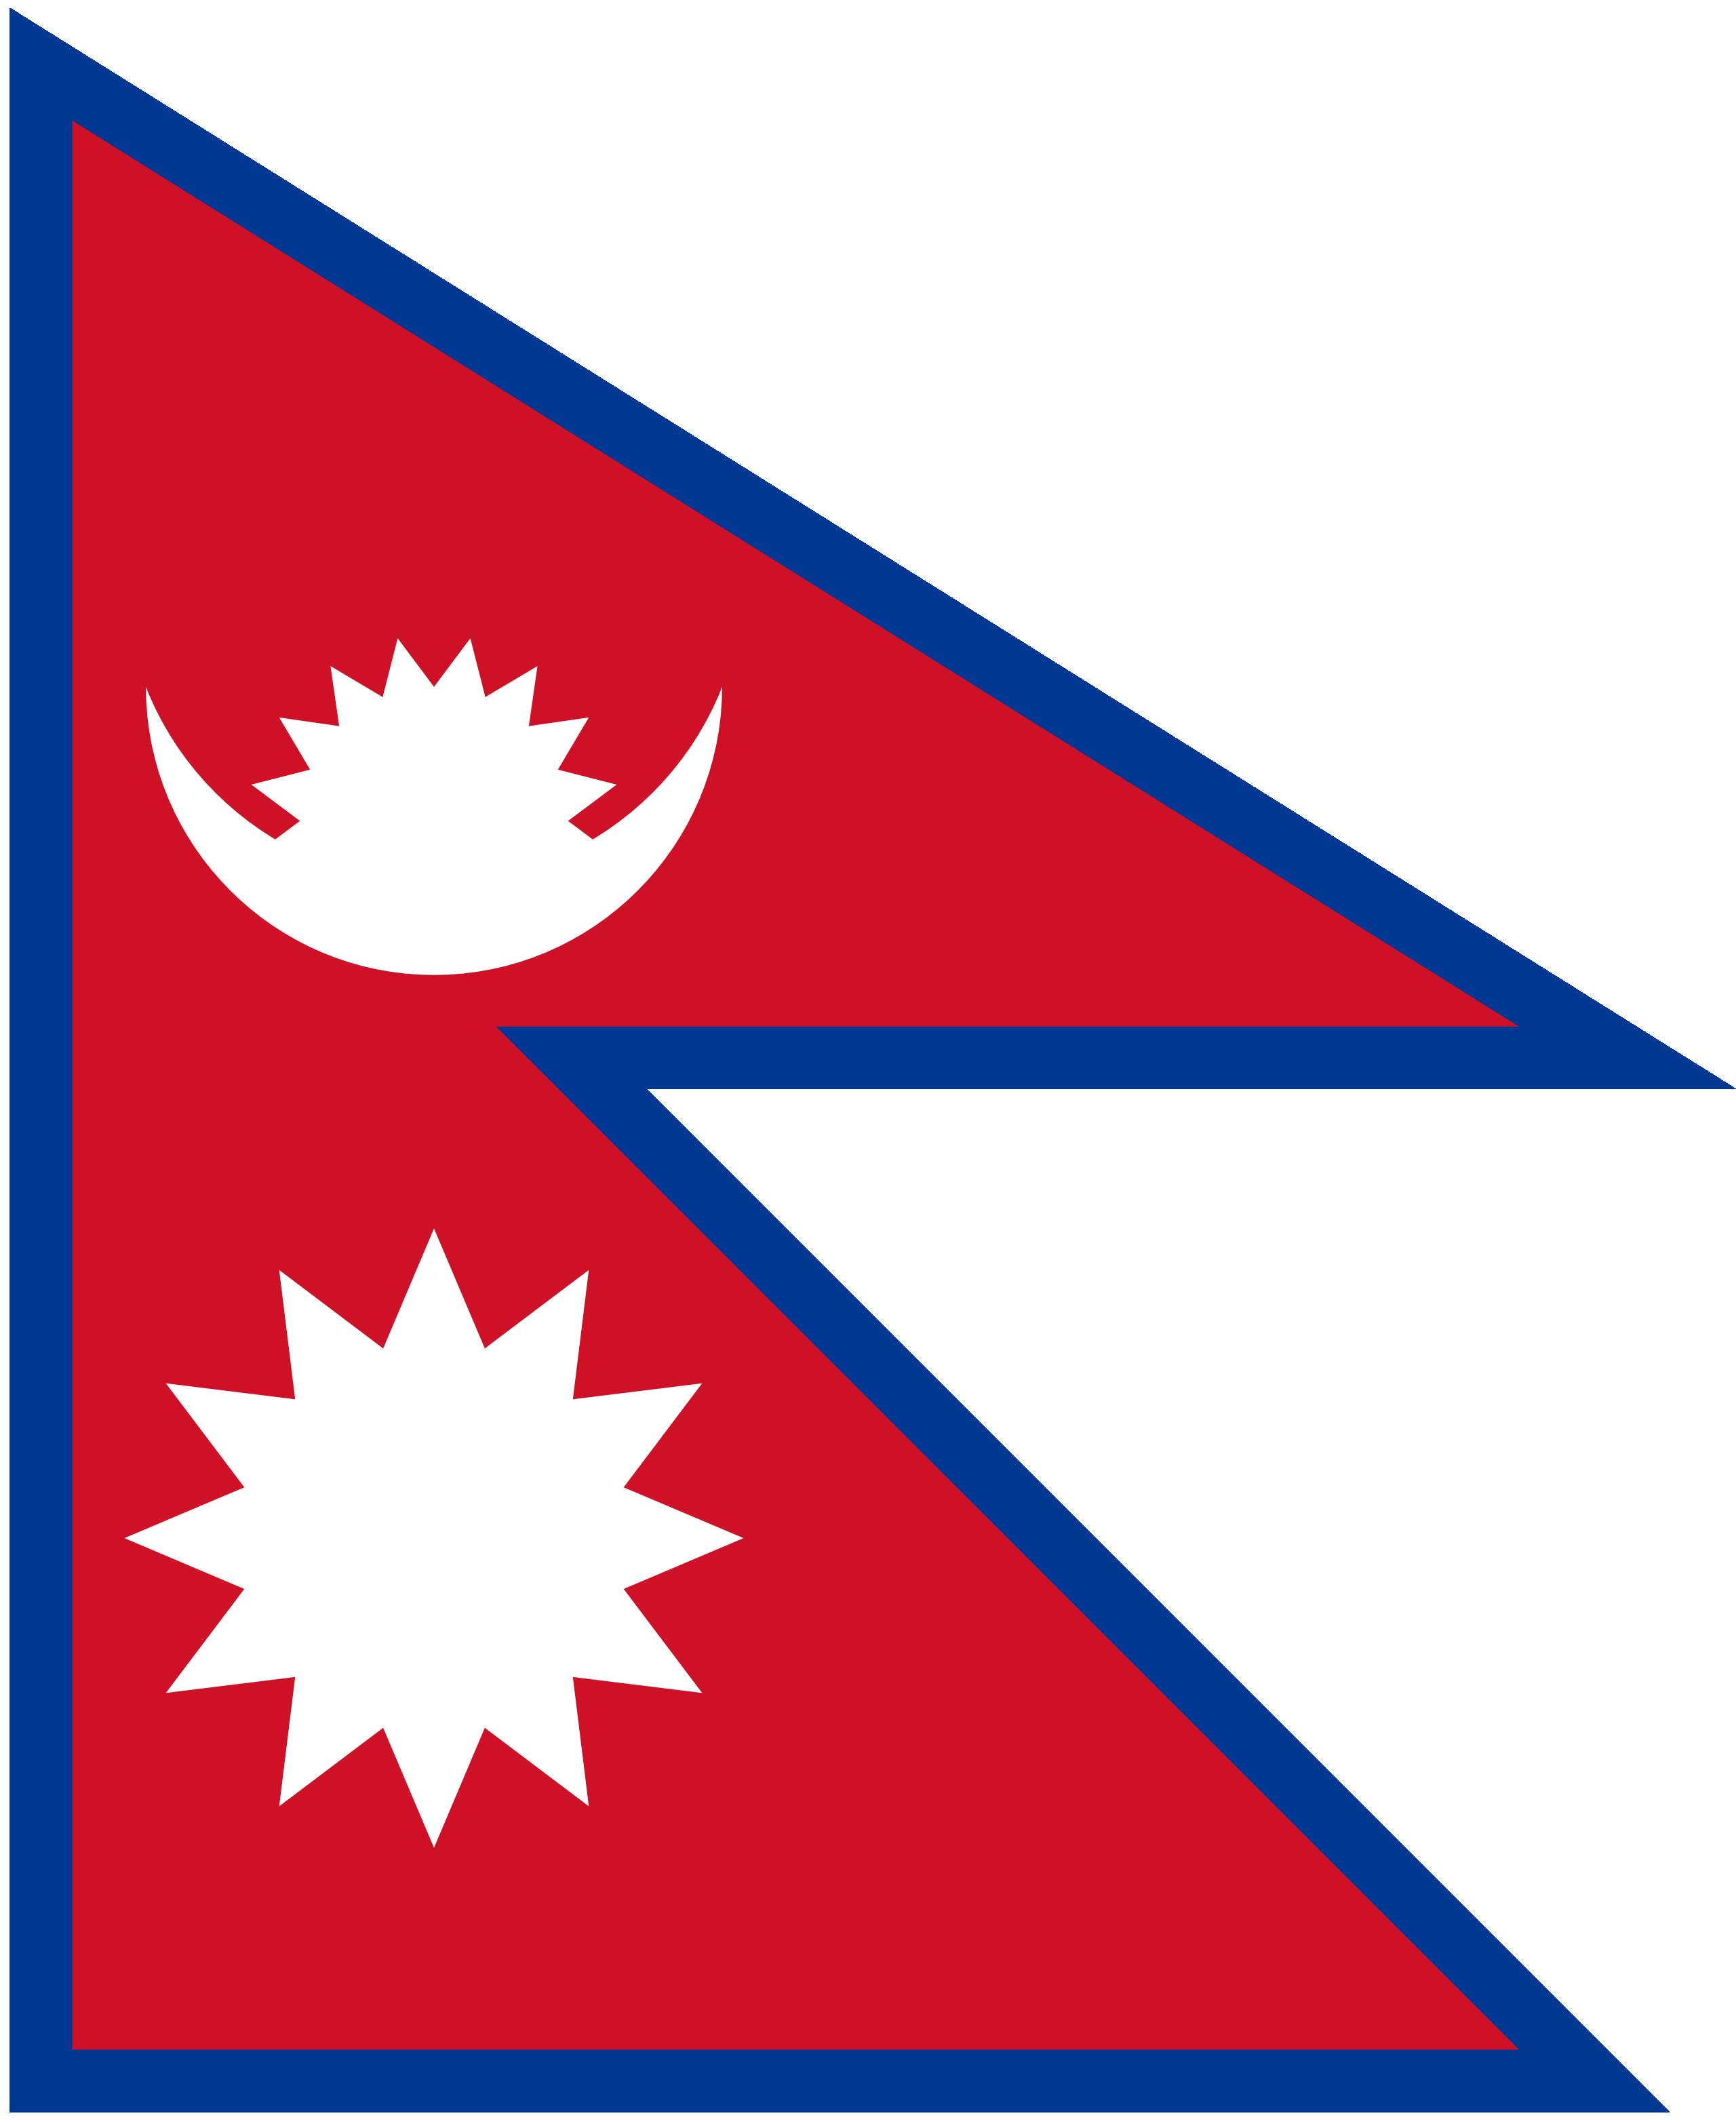 nepal, pays, emblème, logo, symbole - Fonds d'écran HD - Professor-falken.com